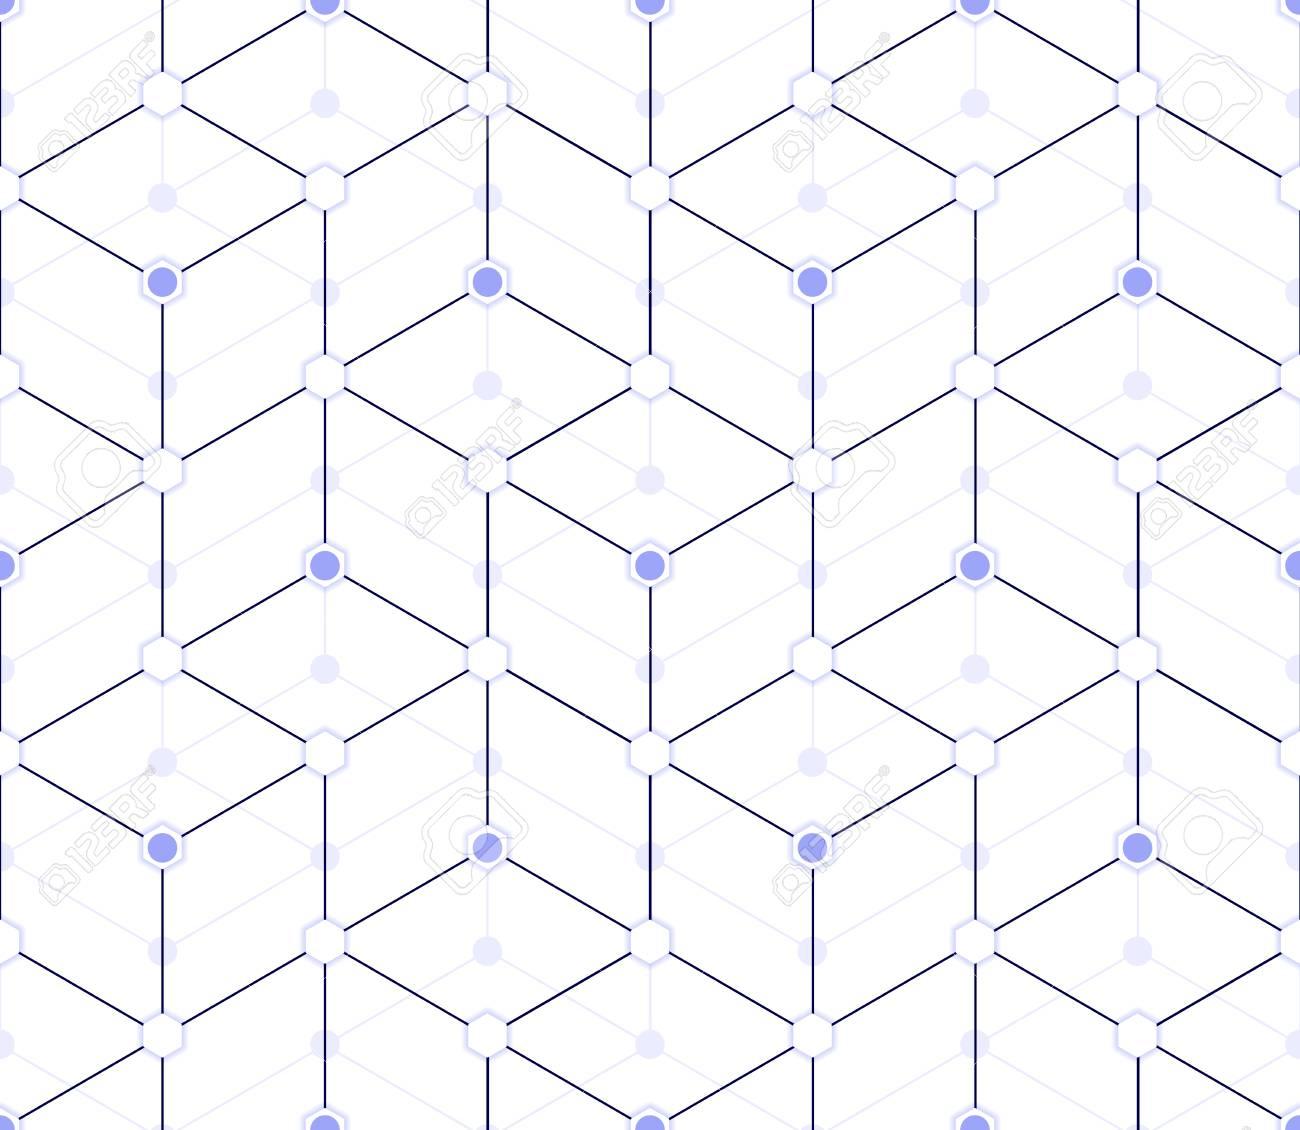 Patrón Transparente De Múltiples Capas En Tonos Azules, En Forma De ...